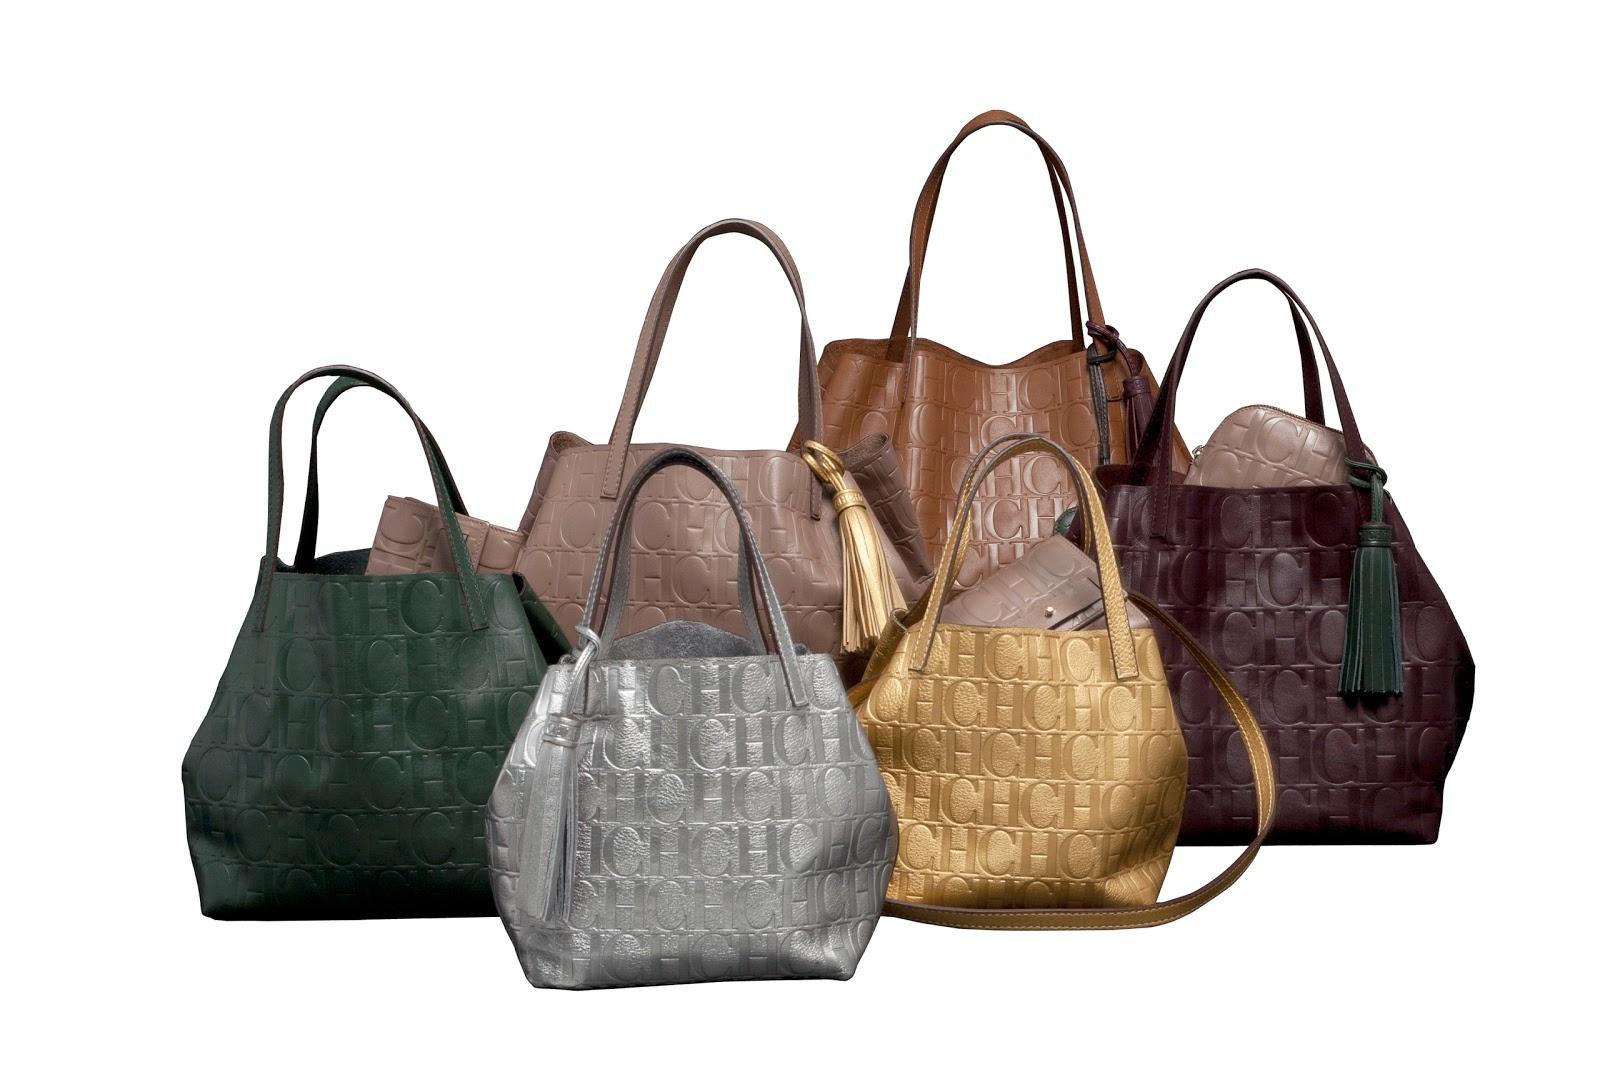 008156108 Carolina Herrera Handbags Online | Stanford Center for Opportunity ...